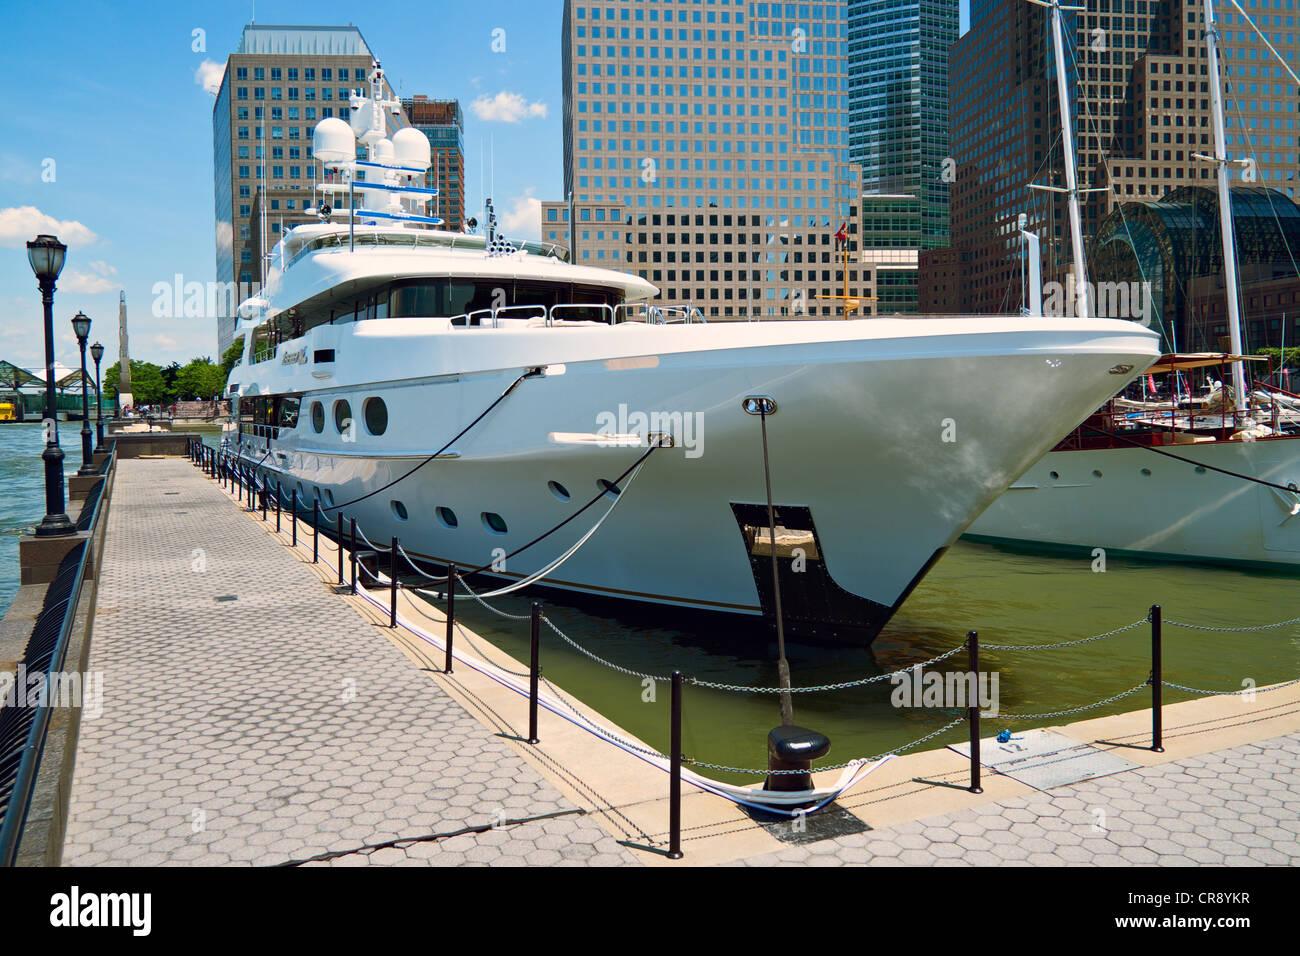 Yacht Remember Me docked in lower Manhattan, New York - Stock Image